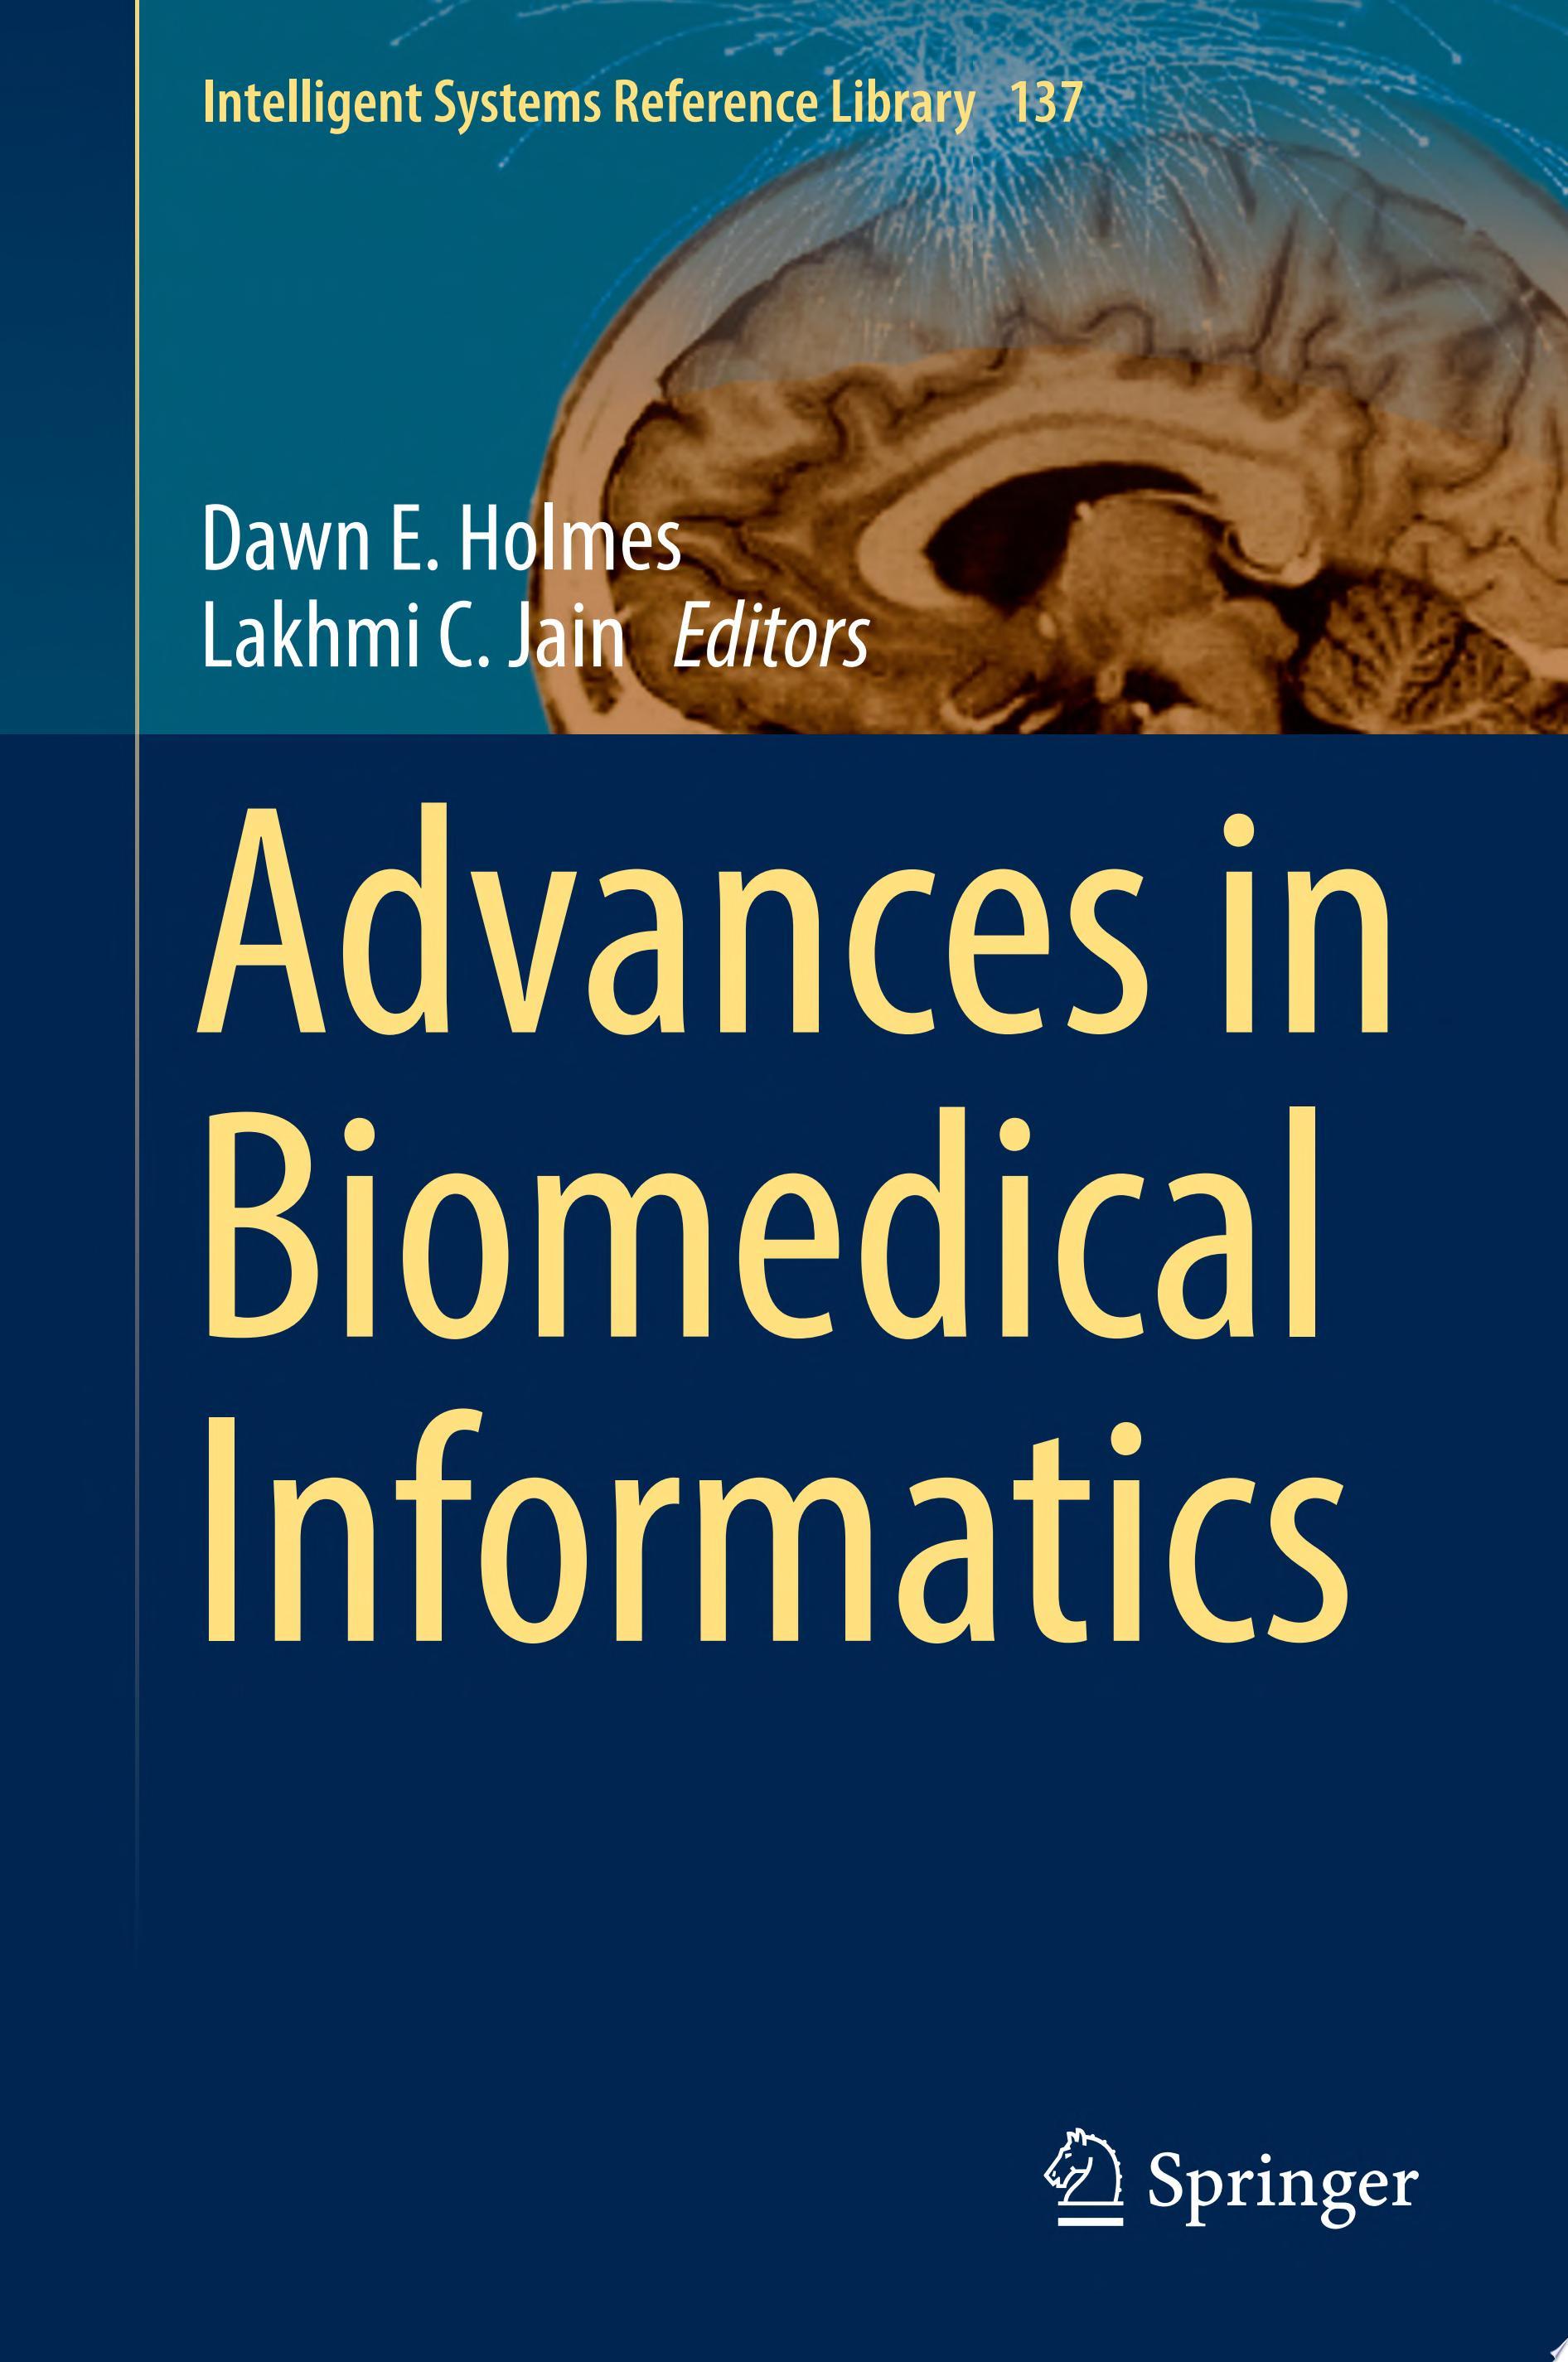 Advances in Biomedical Informatics